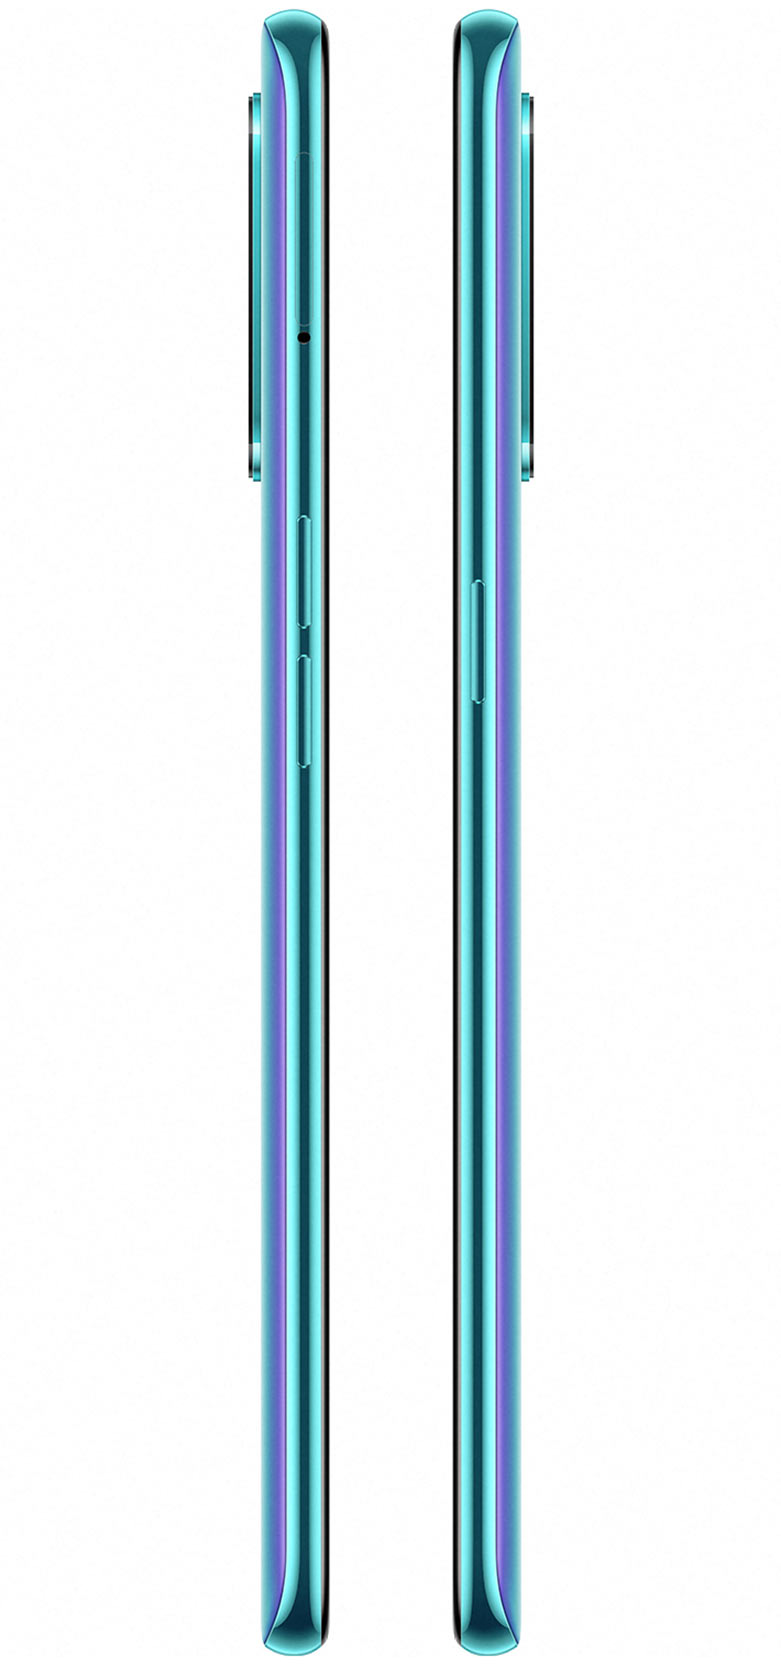 OnePlus Nord CE 5G Blue Void 8GB | 128GB